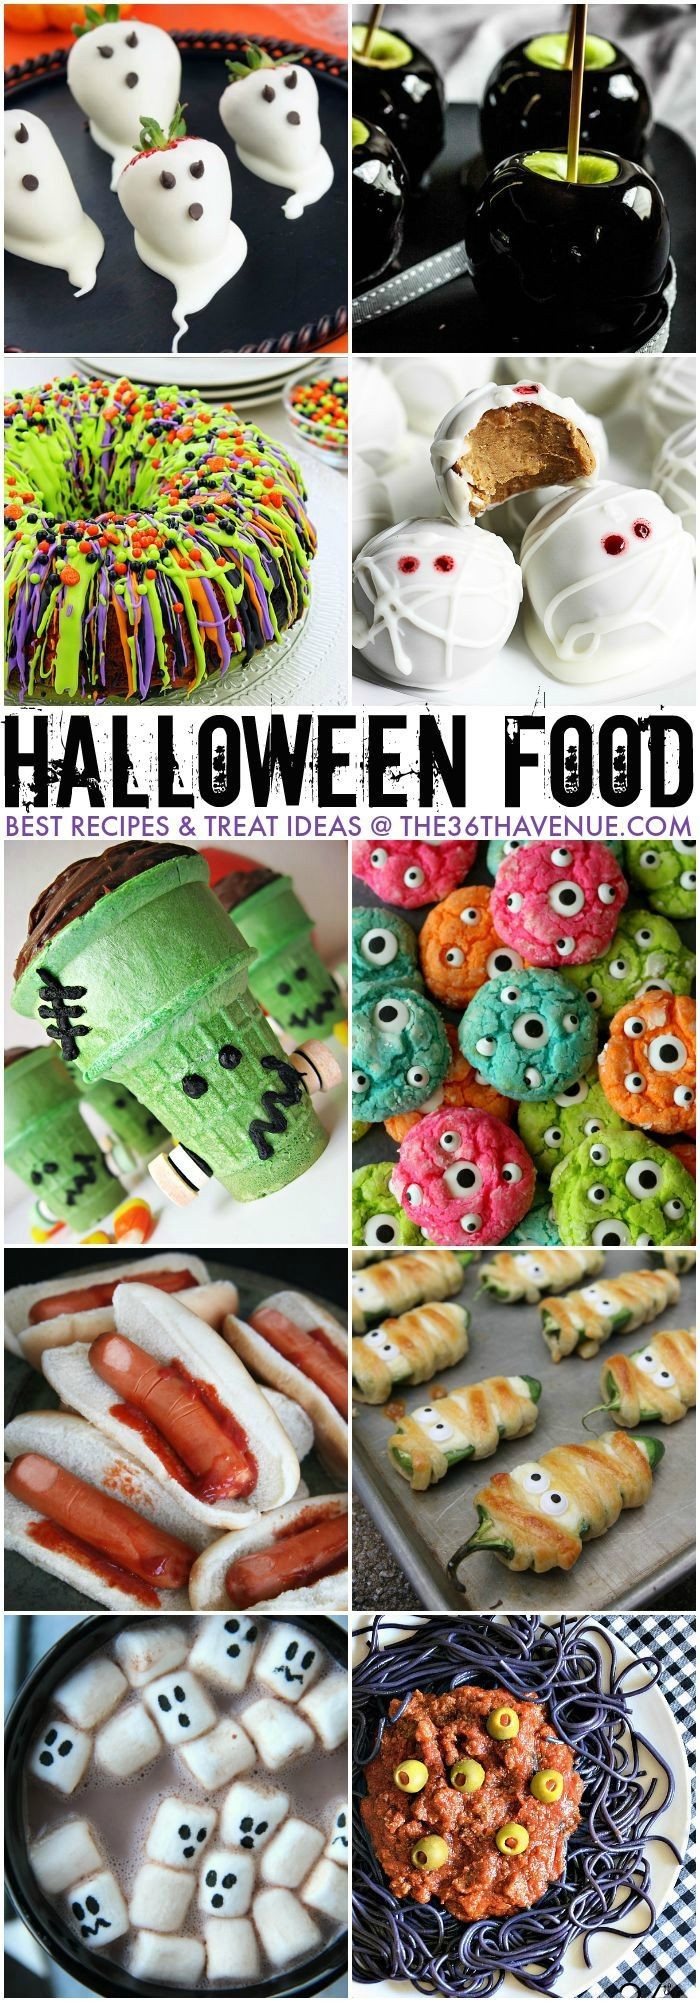 Best 25+ Gross halloween foods ideas on Pinterest | Scary food ...